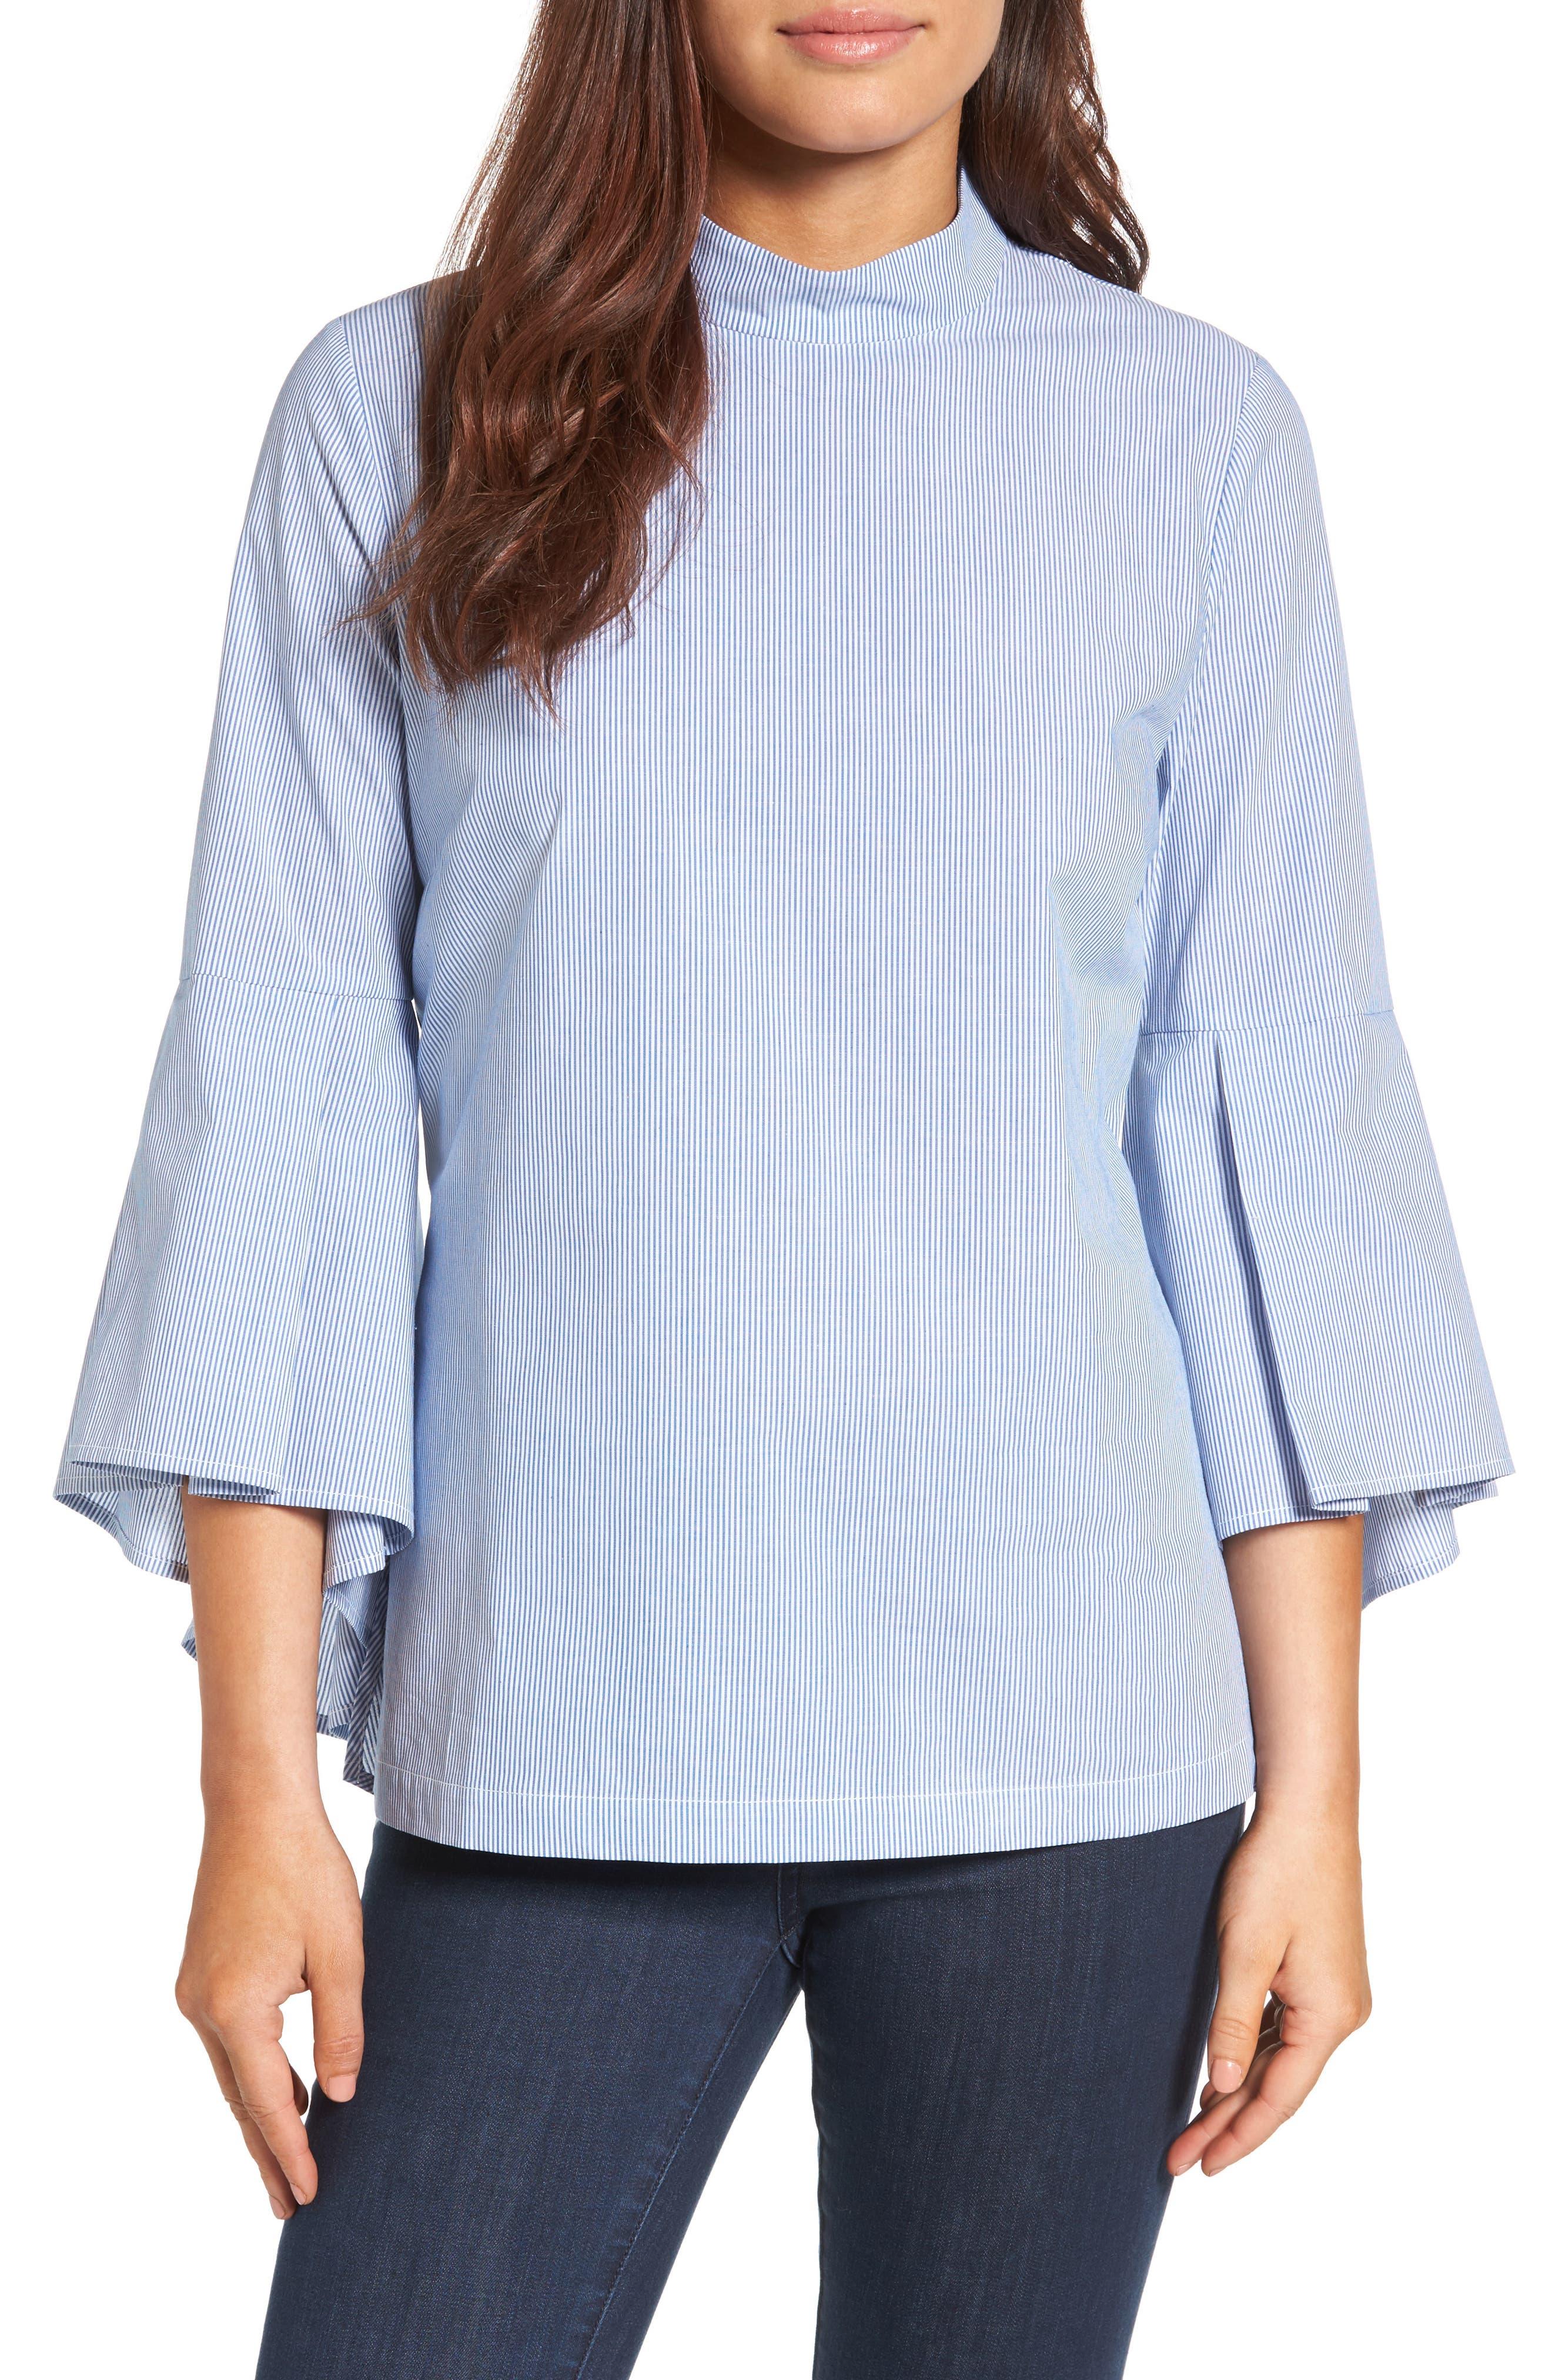 Ruffle Sleeve Poplin Shirt,                         Main,                         color, Blue/ White Stripe